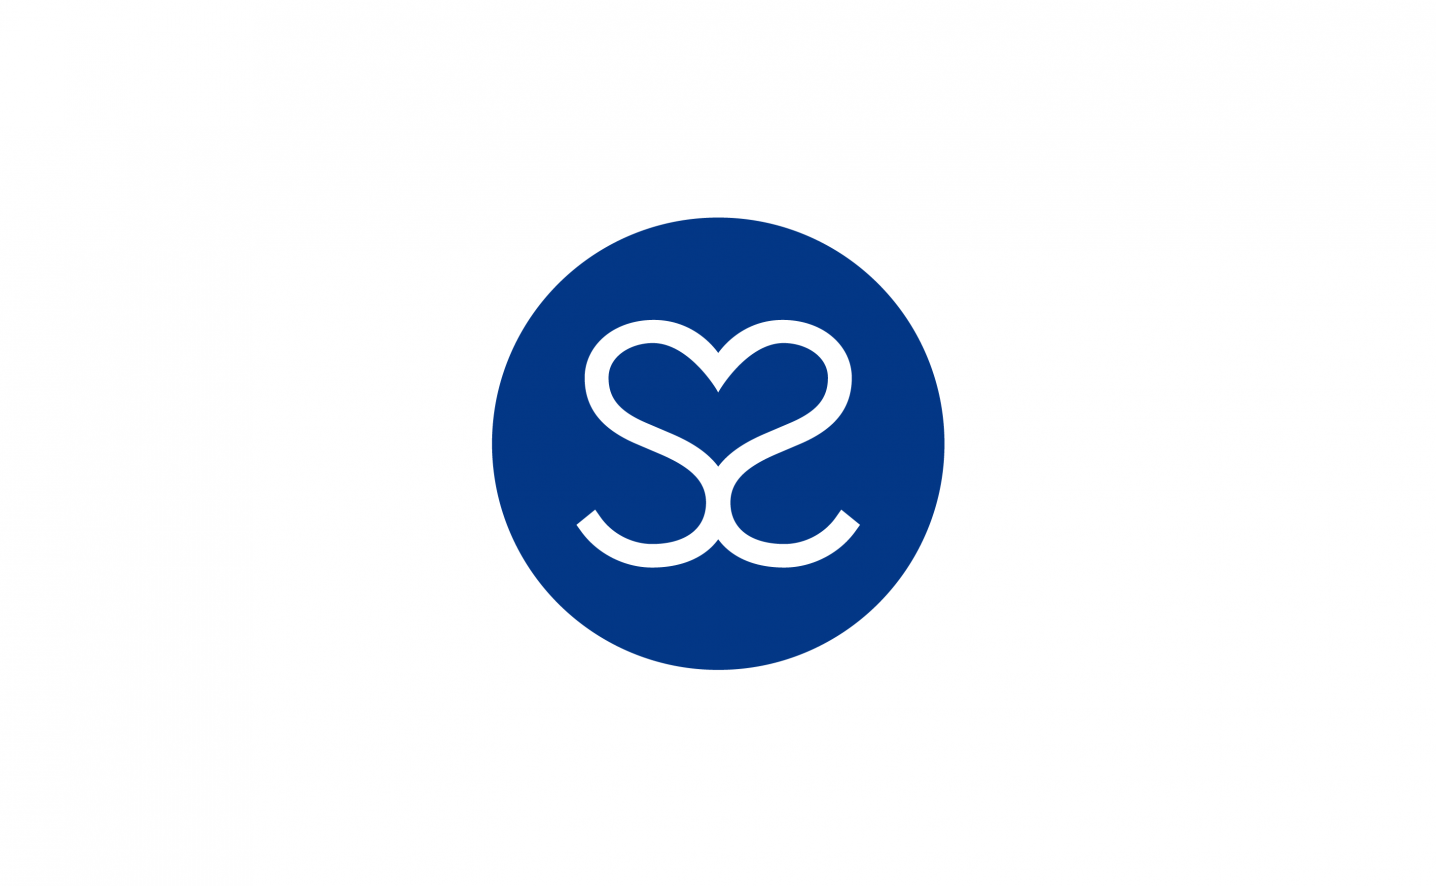 moore-stephens-sandra-logo-design-2